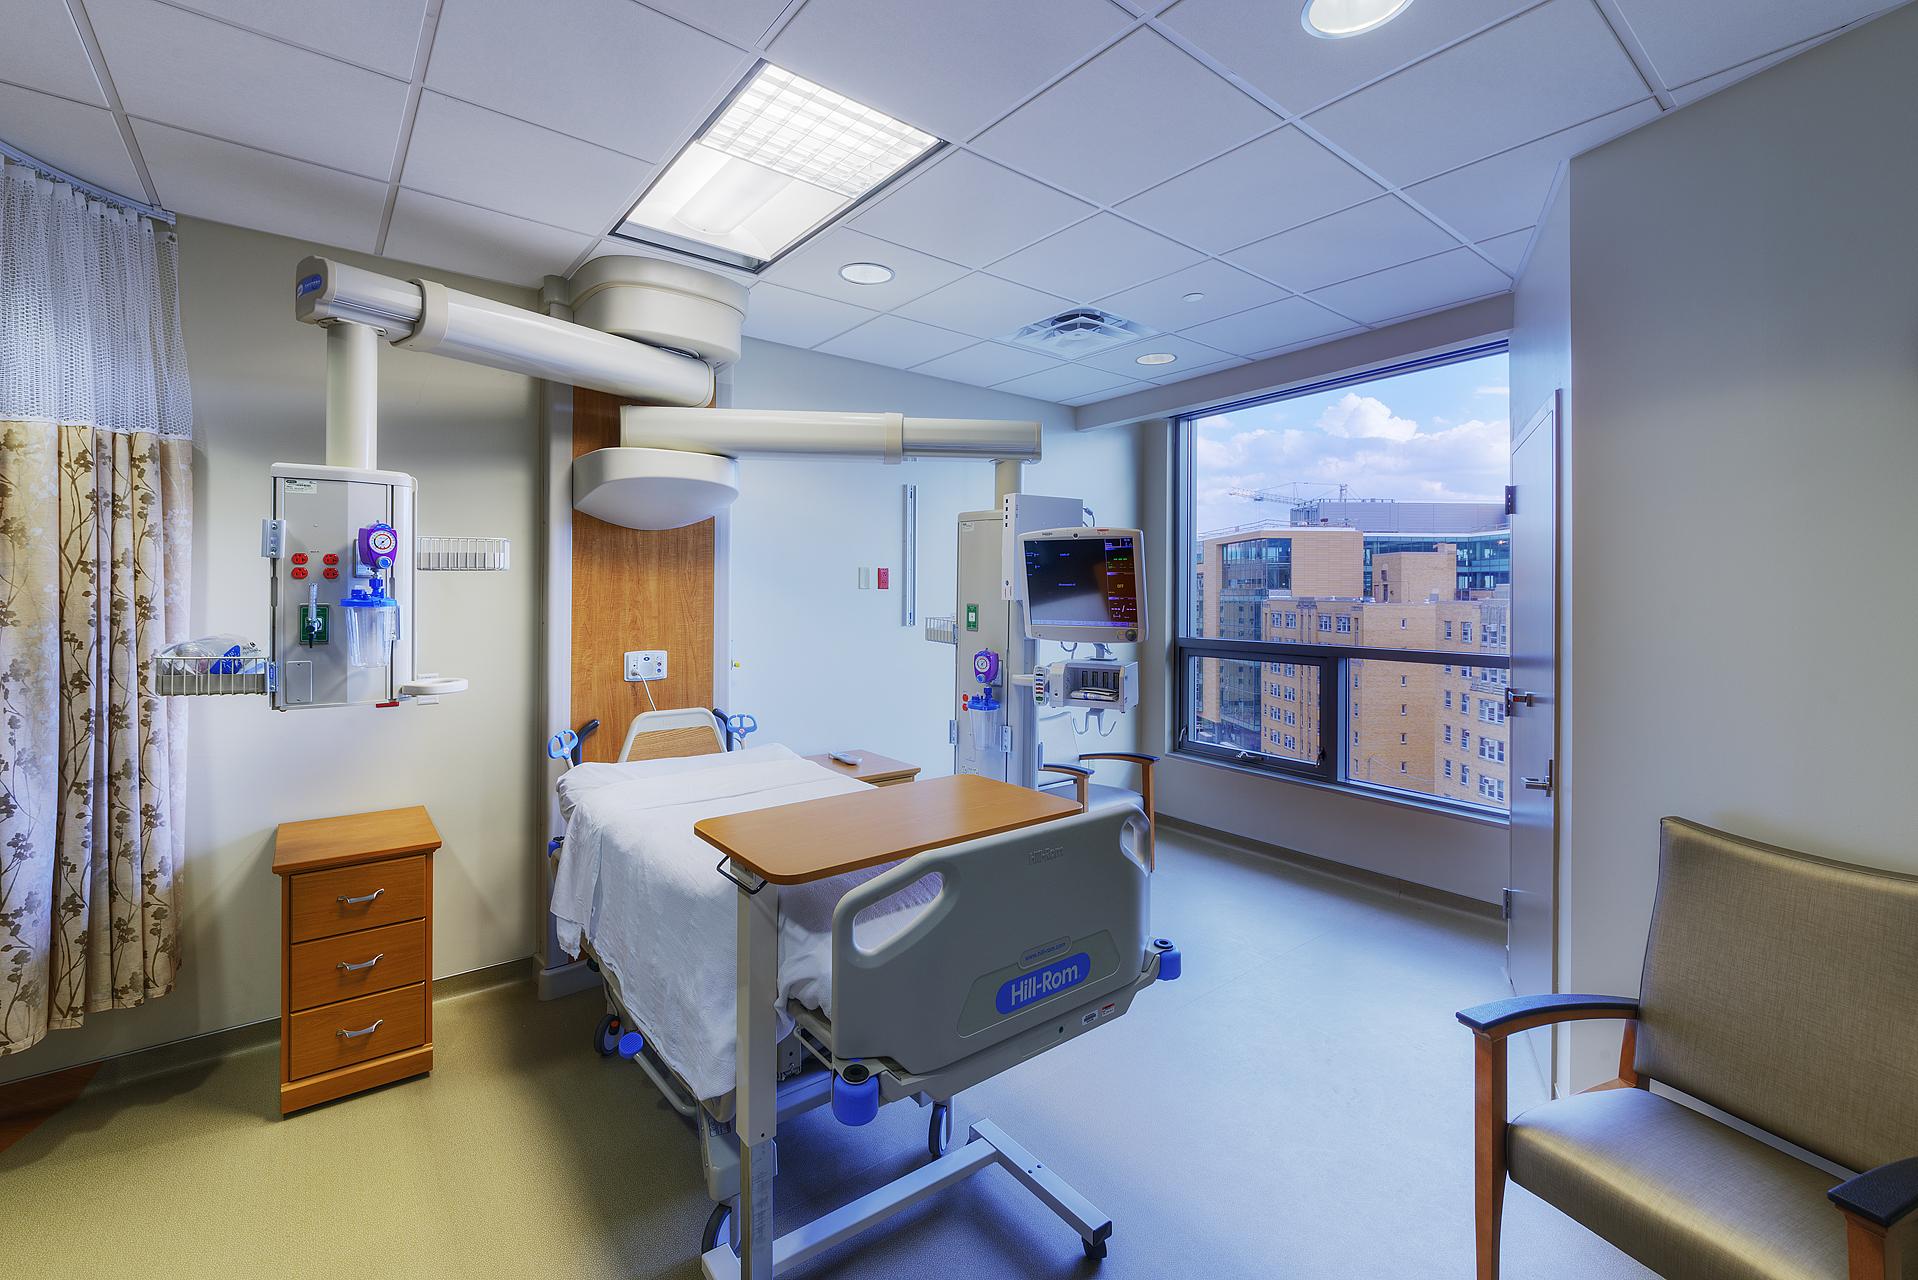 The George Washington University Hospital ICU Renovation wwwusa